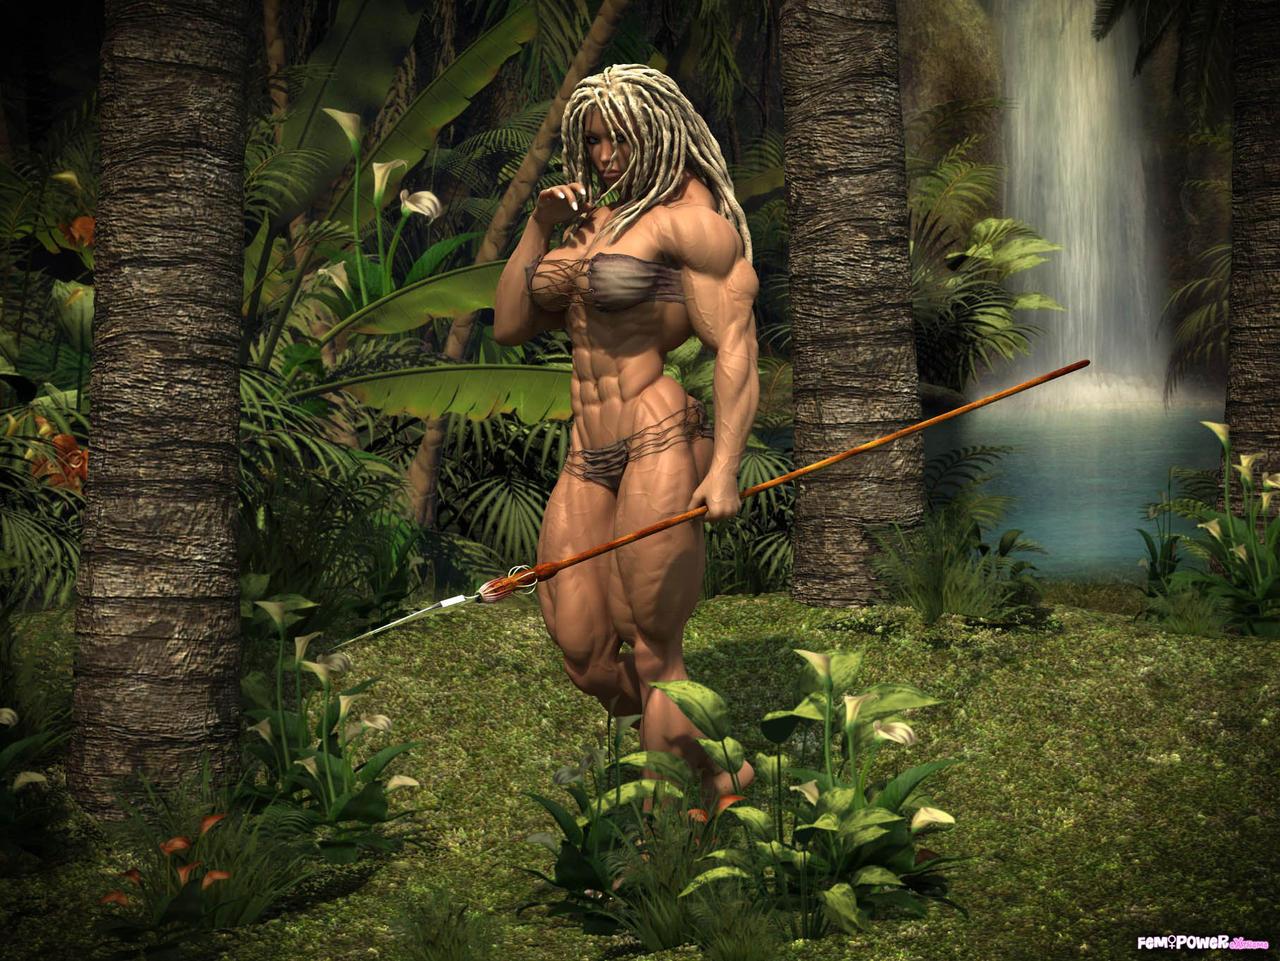 nude erotic jungle art photos